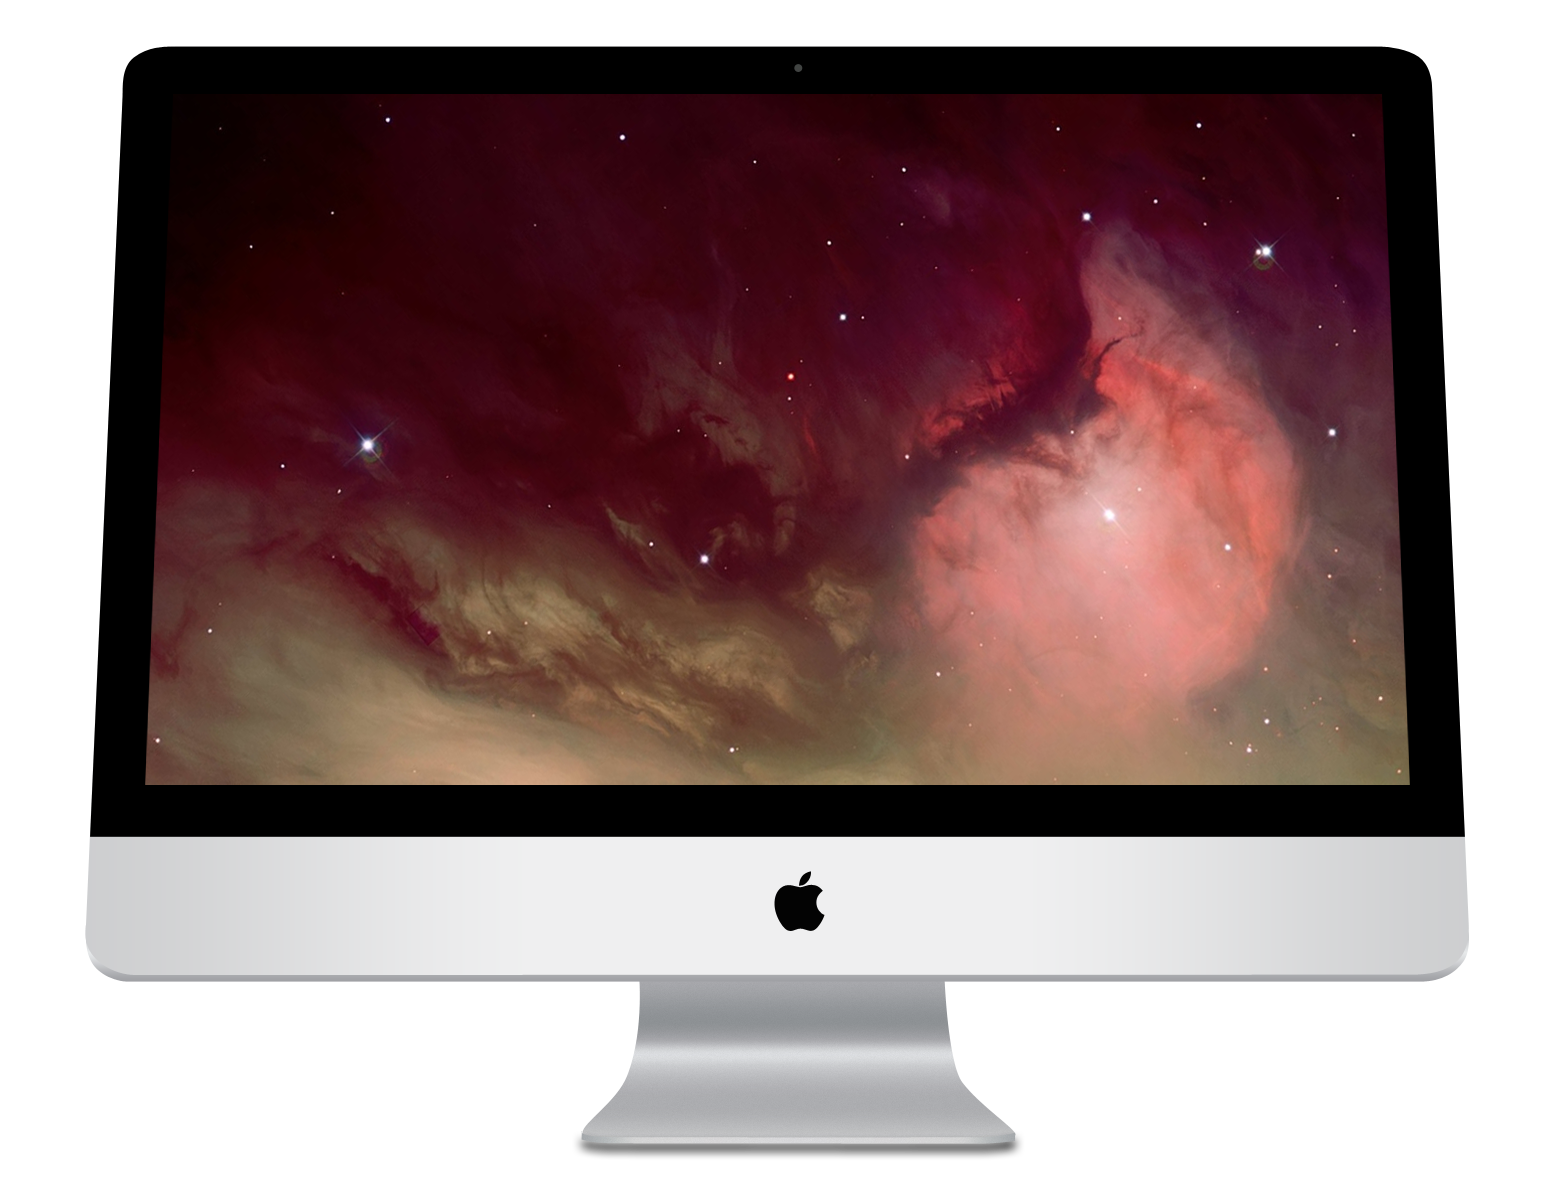 iMac (Intel.